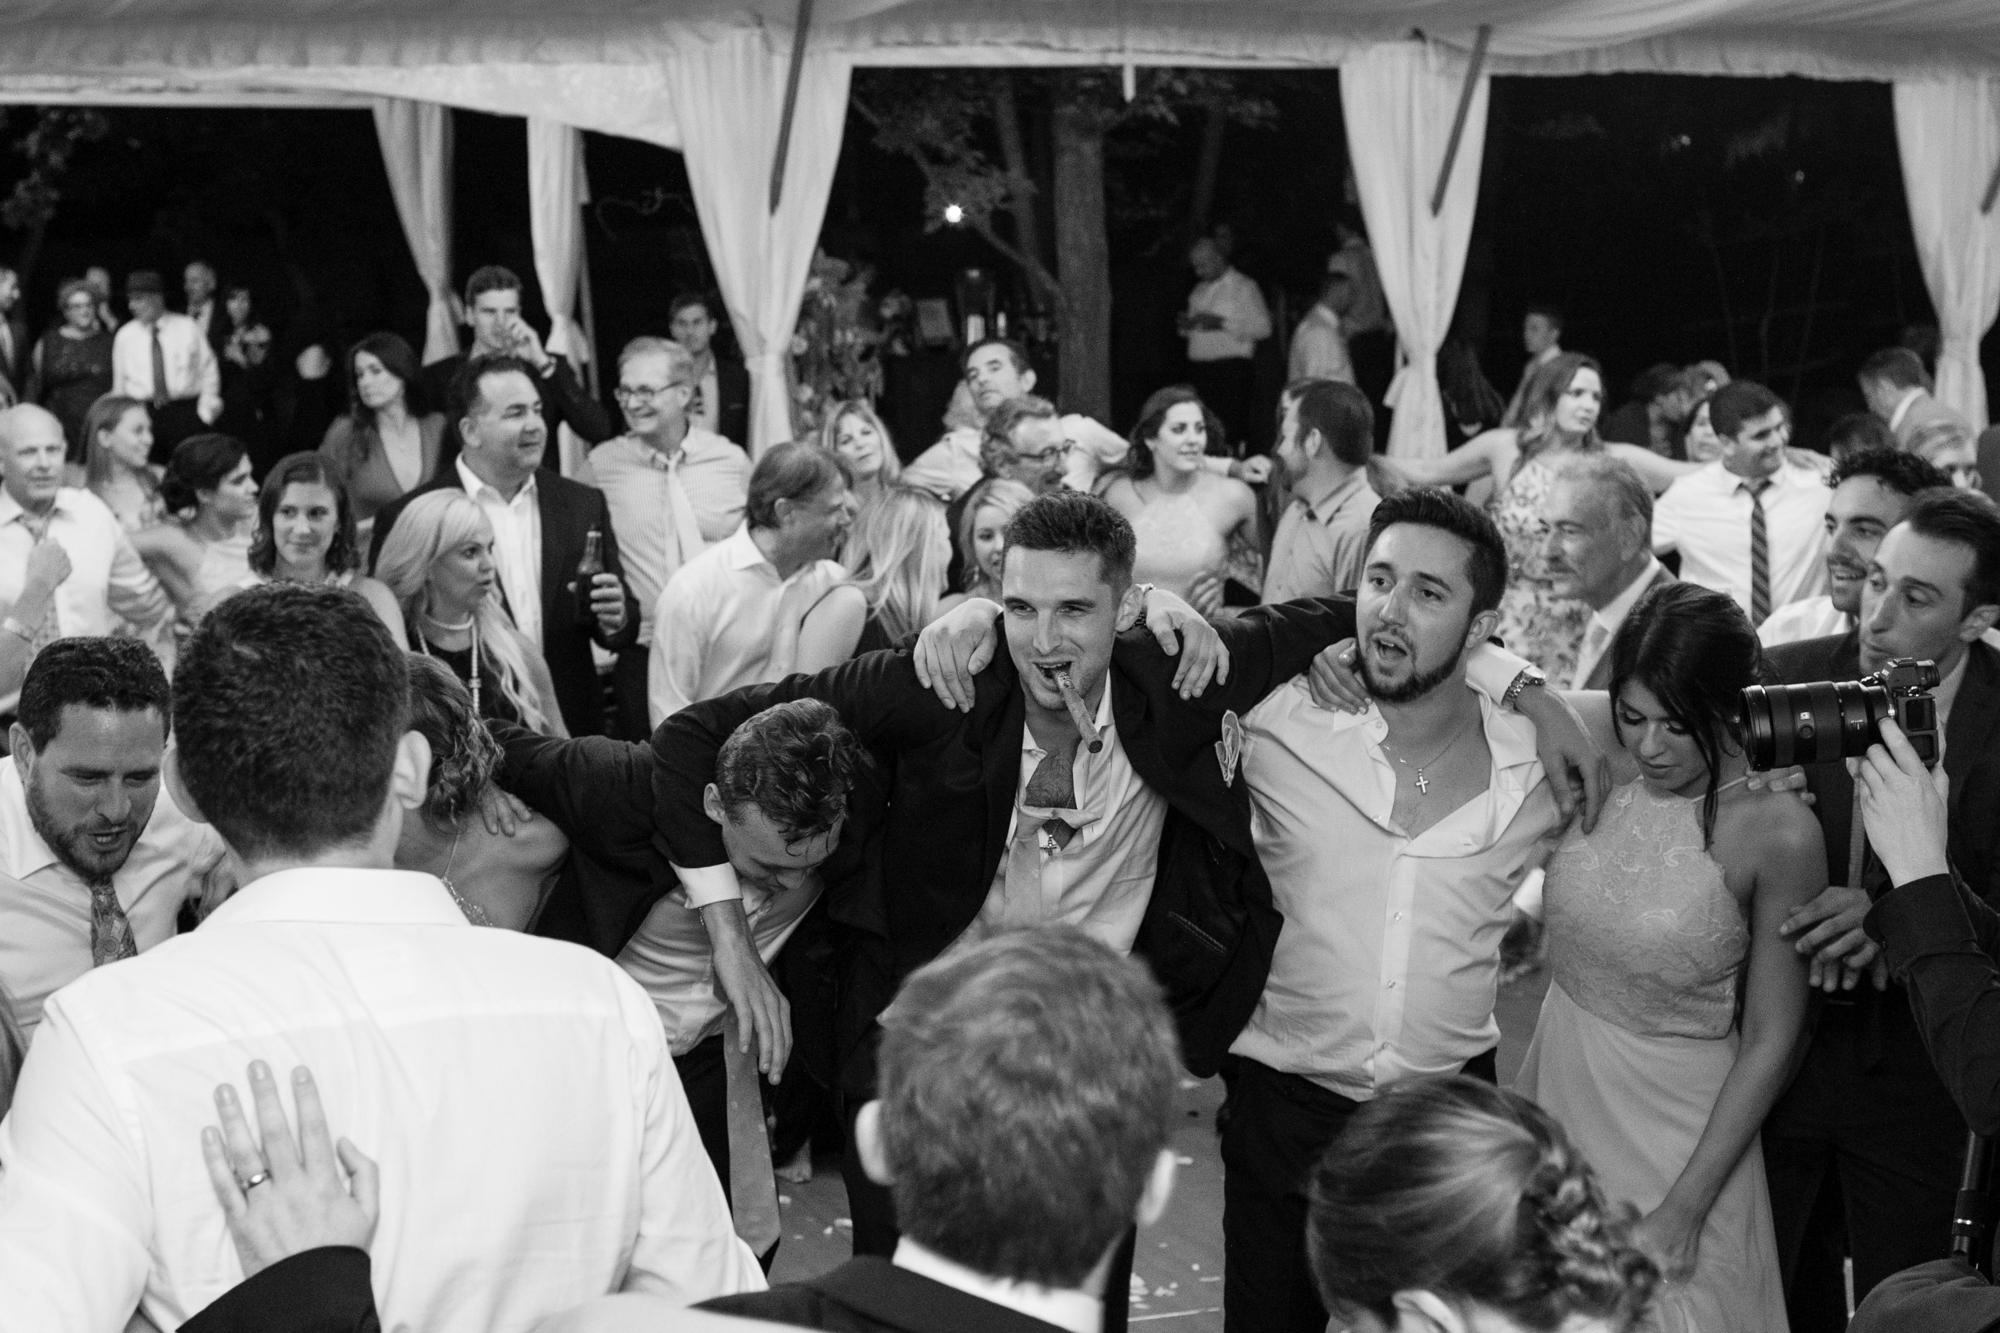 greek-wedding-salt-lake-city-utah-57.jpg